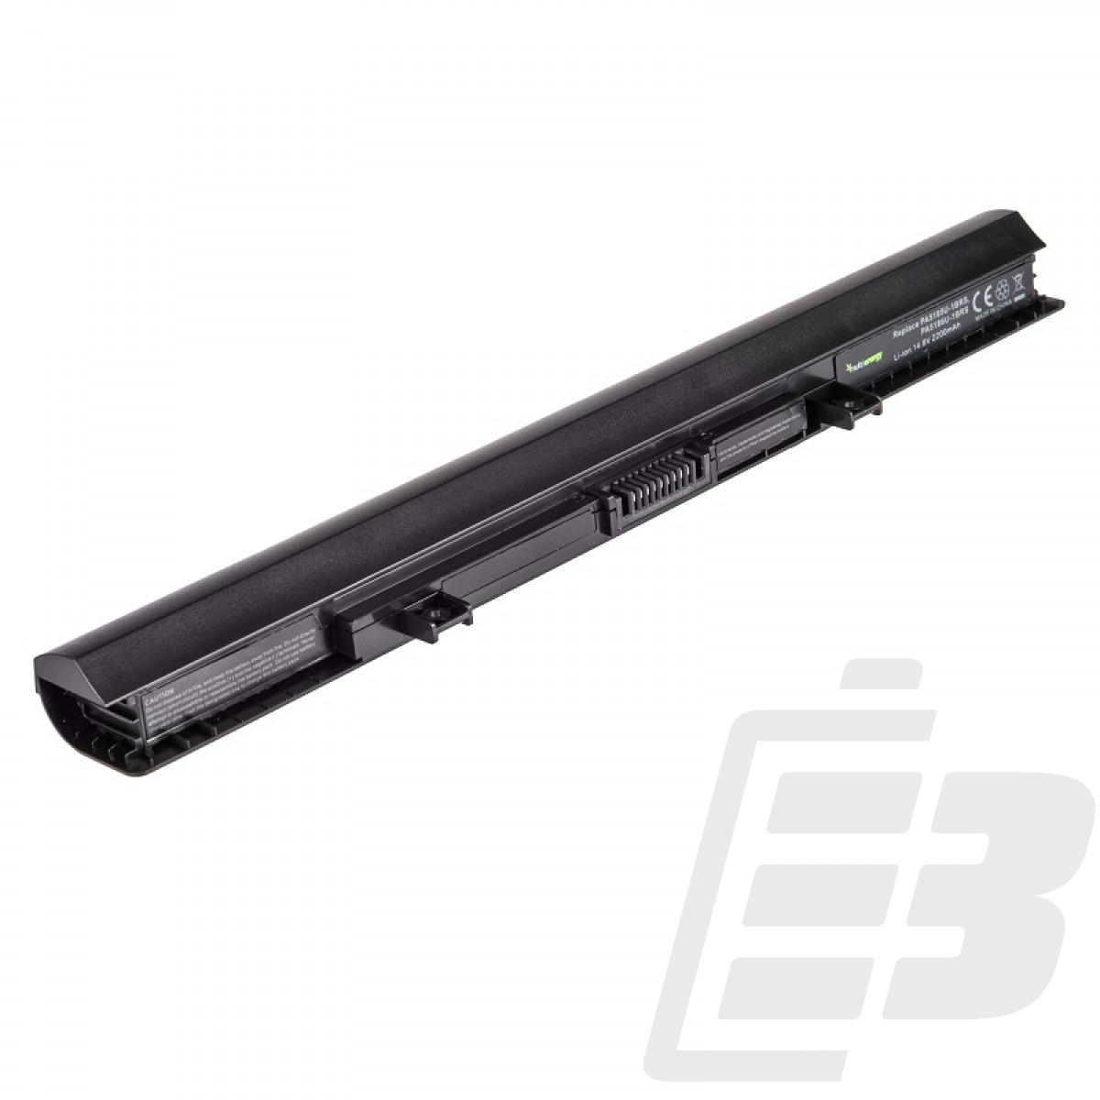 Laptop battery Toshiba Satellite C50_1